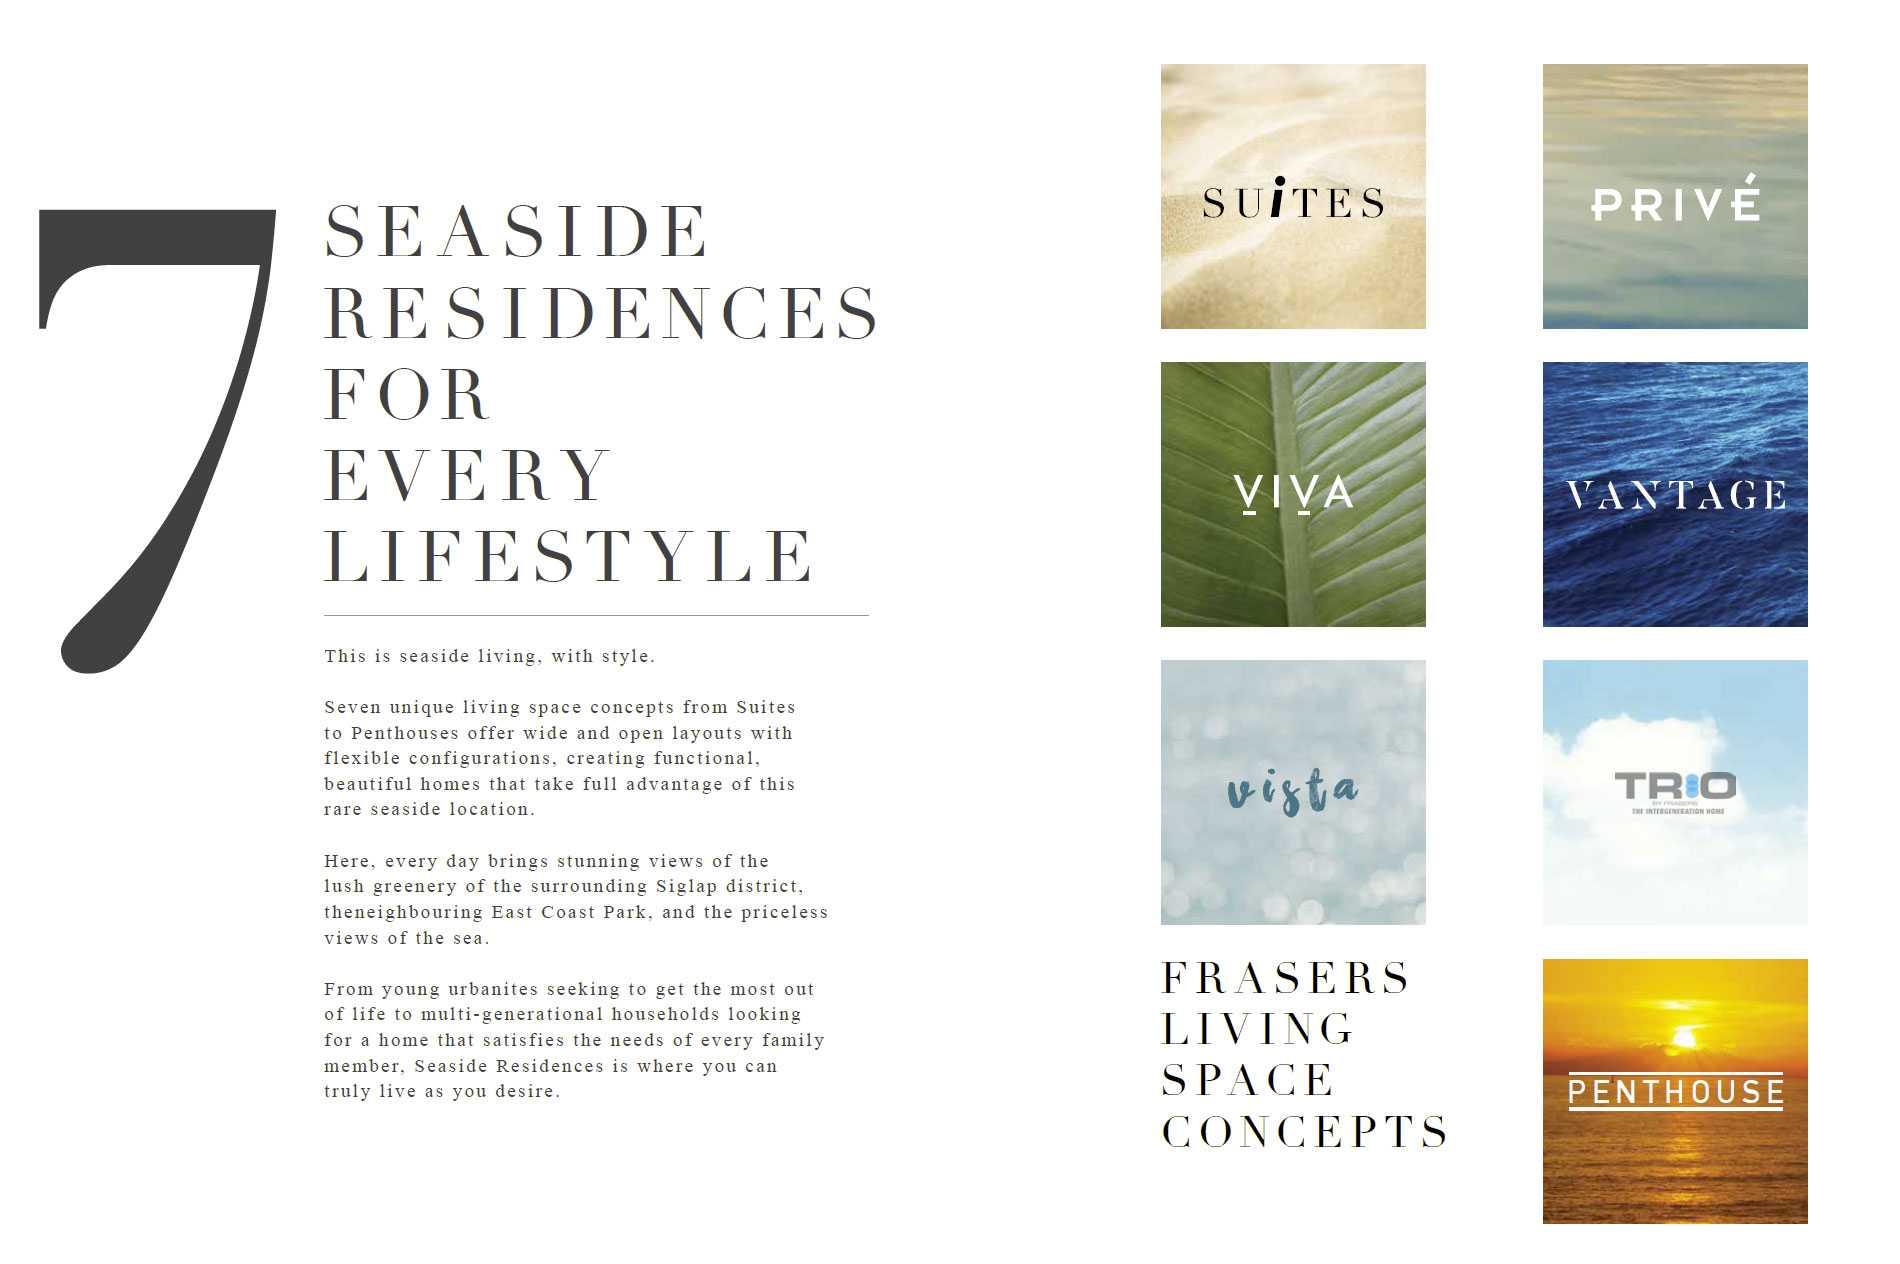 seaside-residences-lifestyle-floor-plan